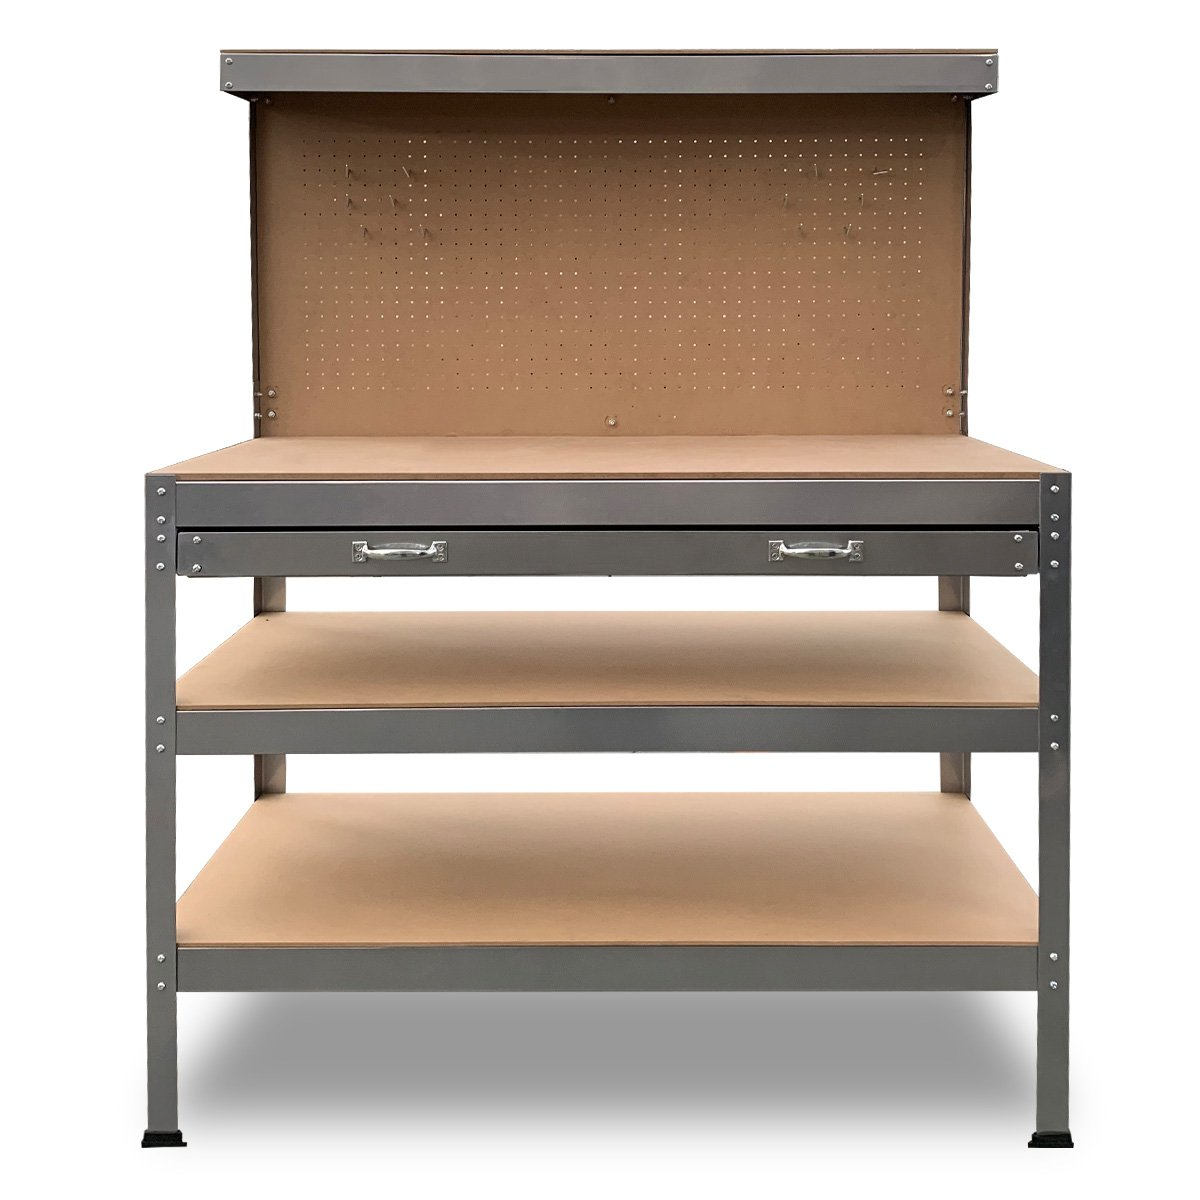 3-Layered Work Bench Garage Storage Table Tool Shop Shelf Silver - $263.9